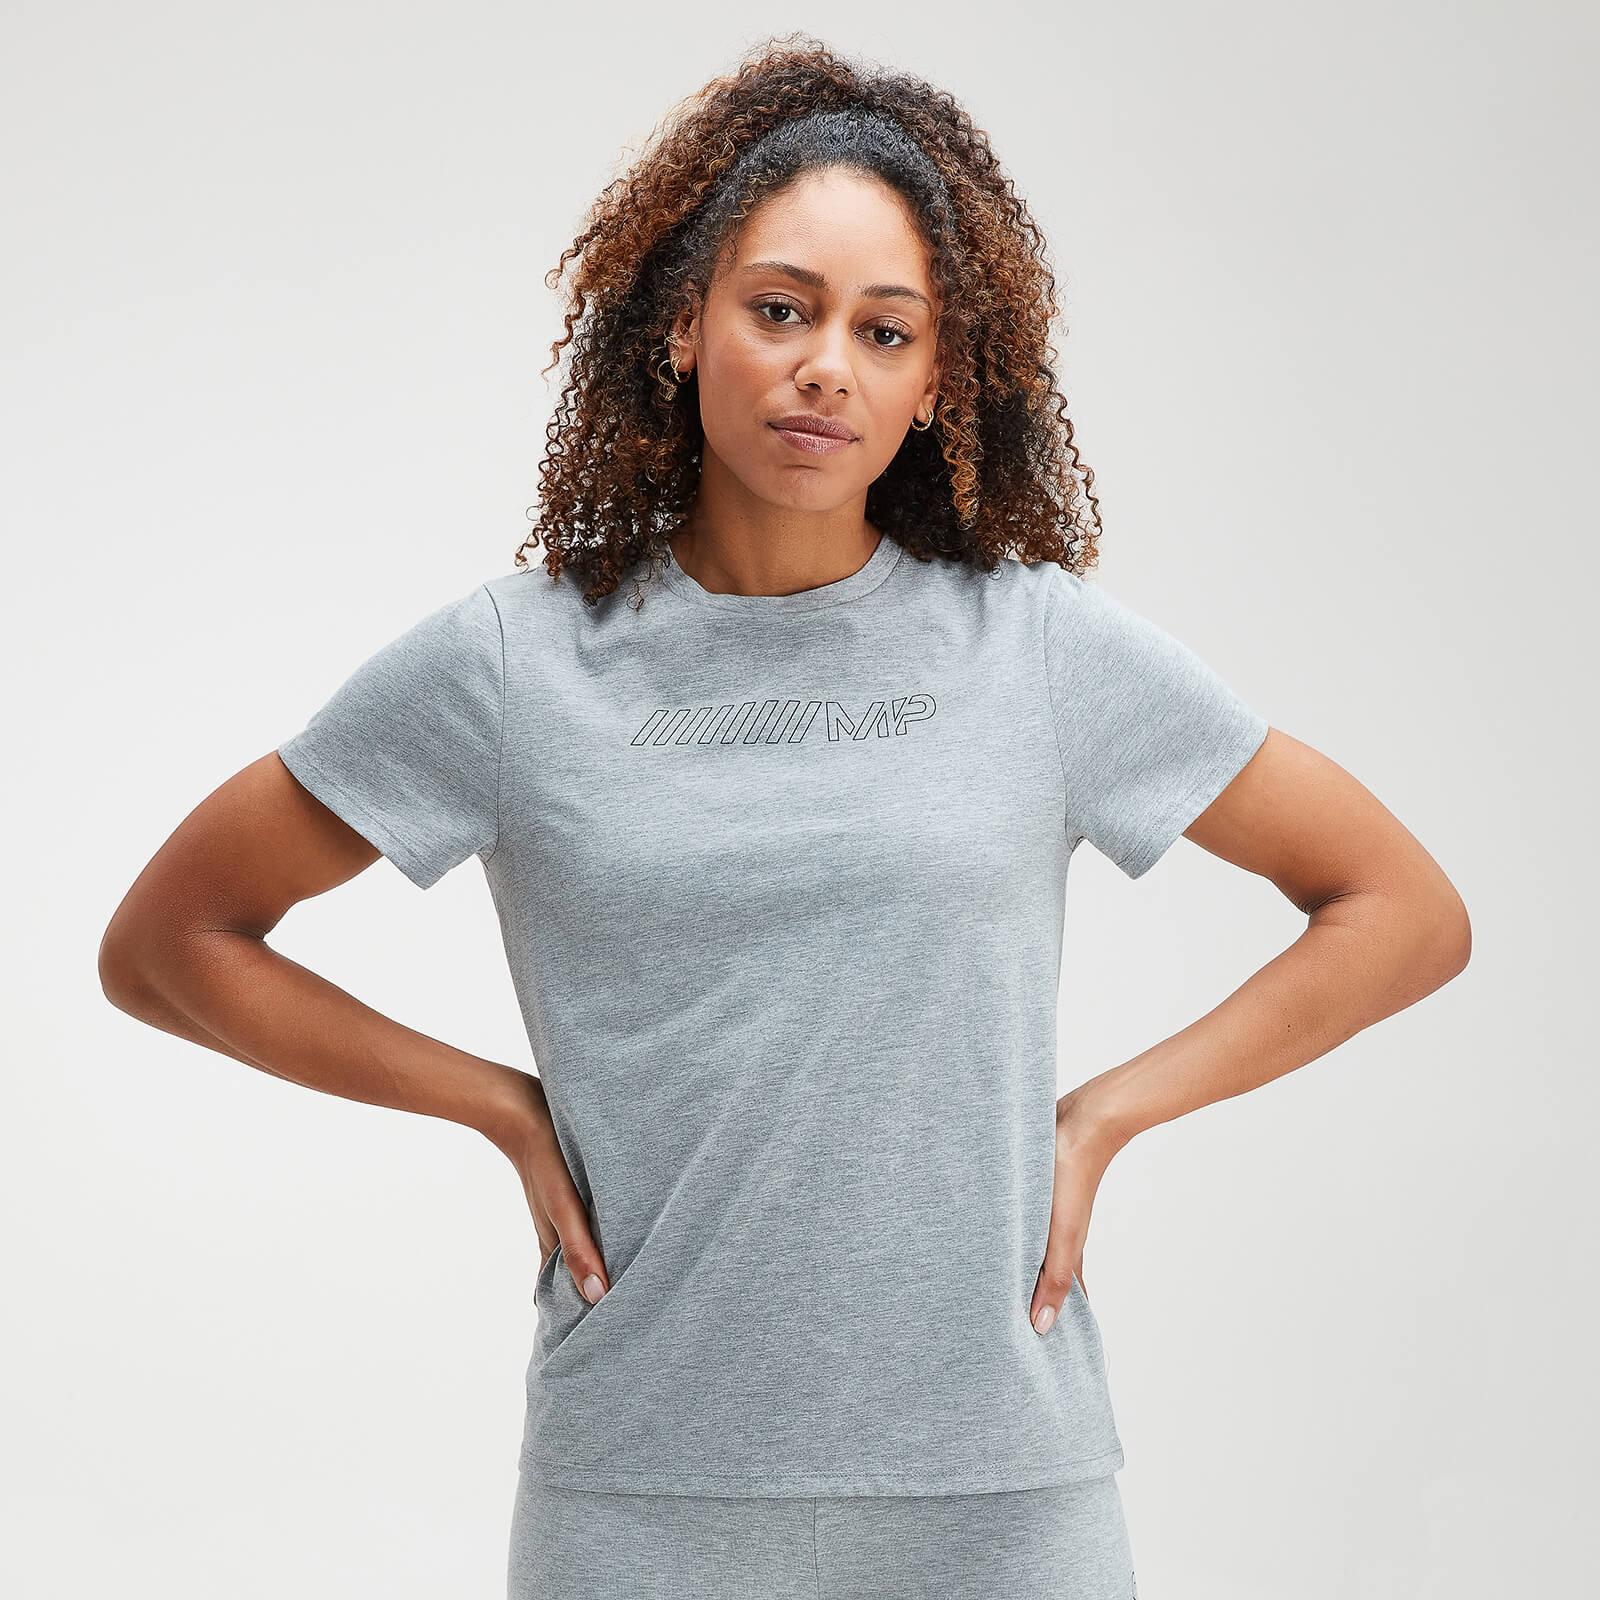 MP Women's Outline Graphic T-Shirt - Grey Marl - XXL